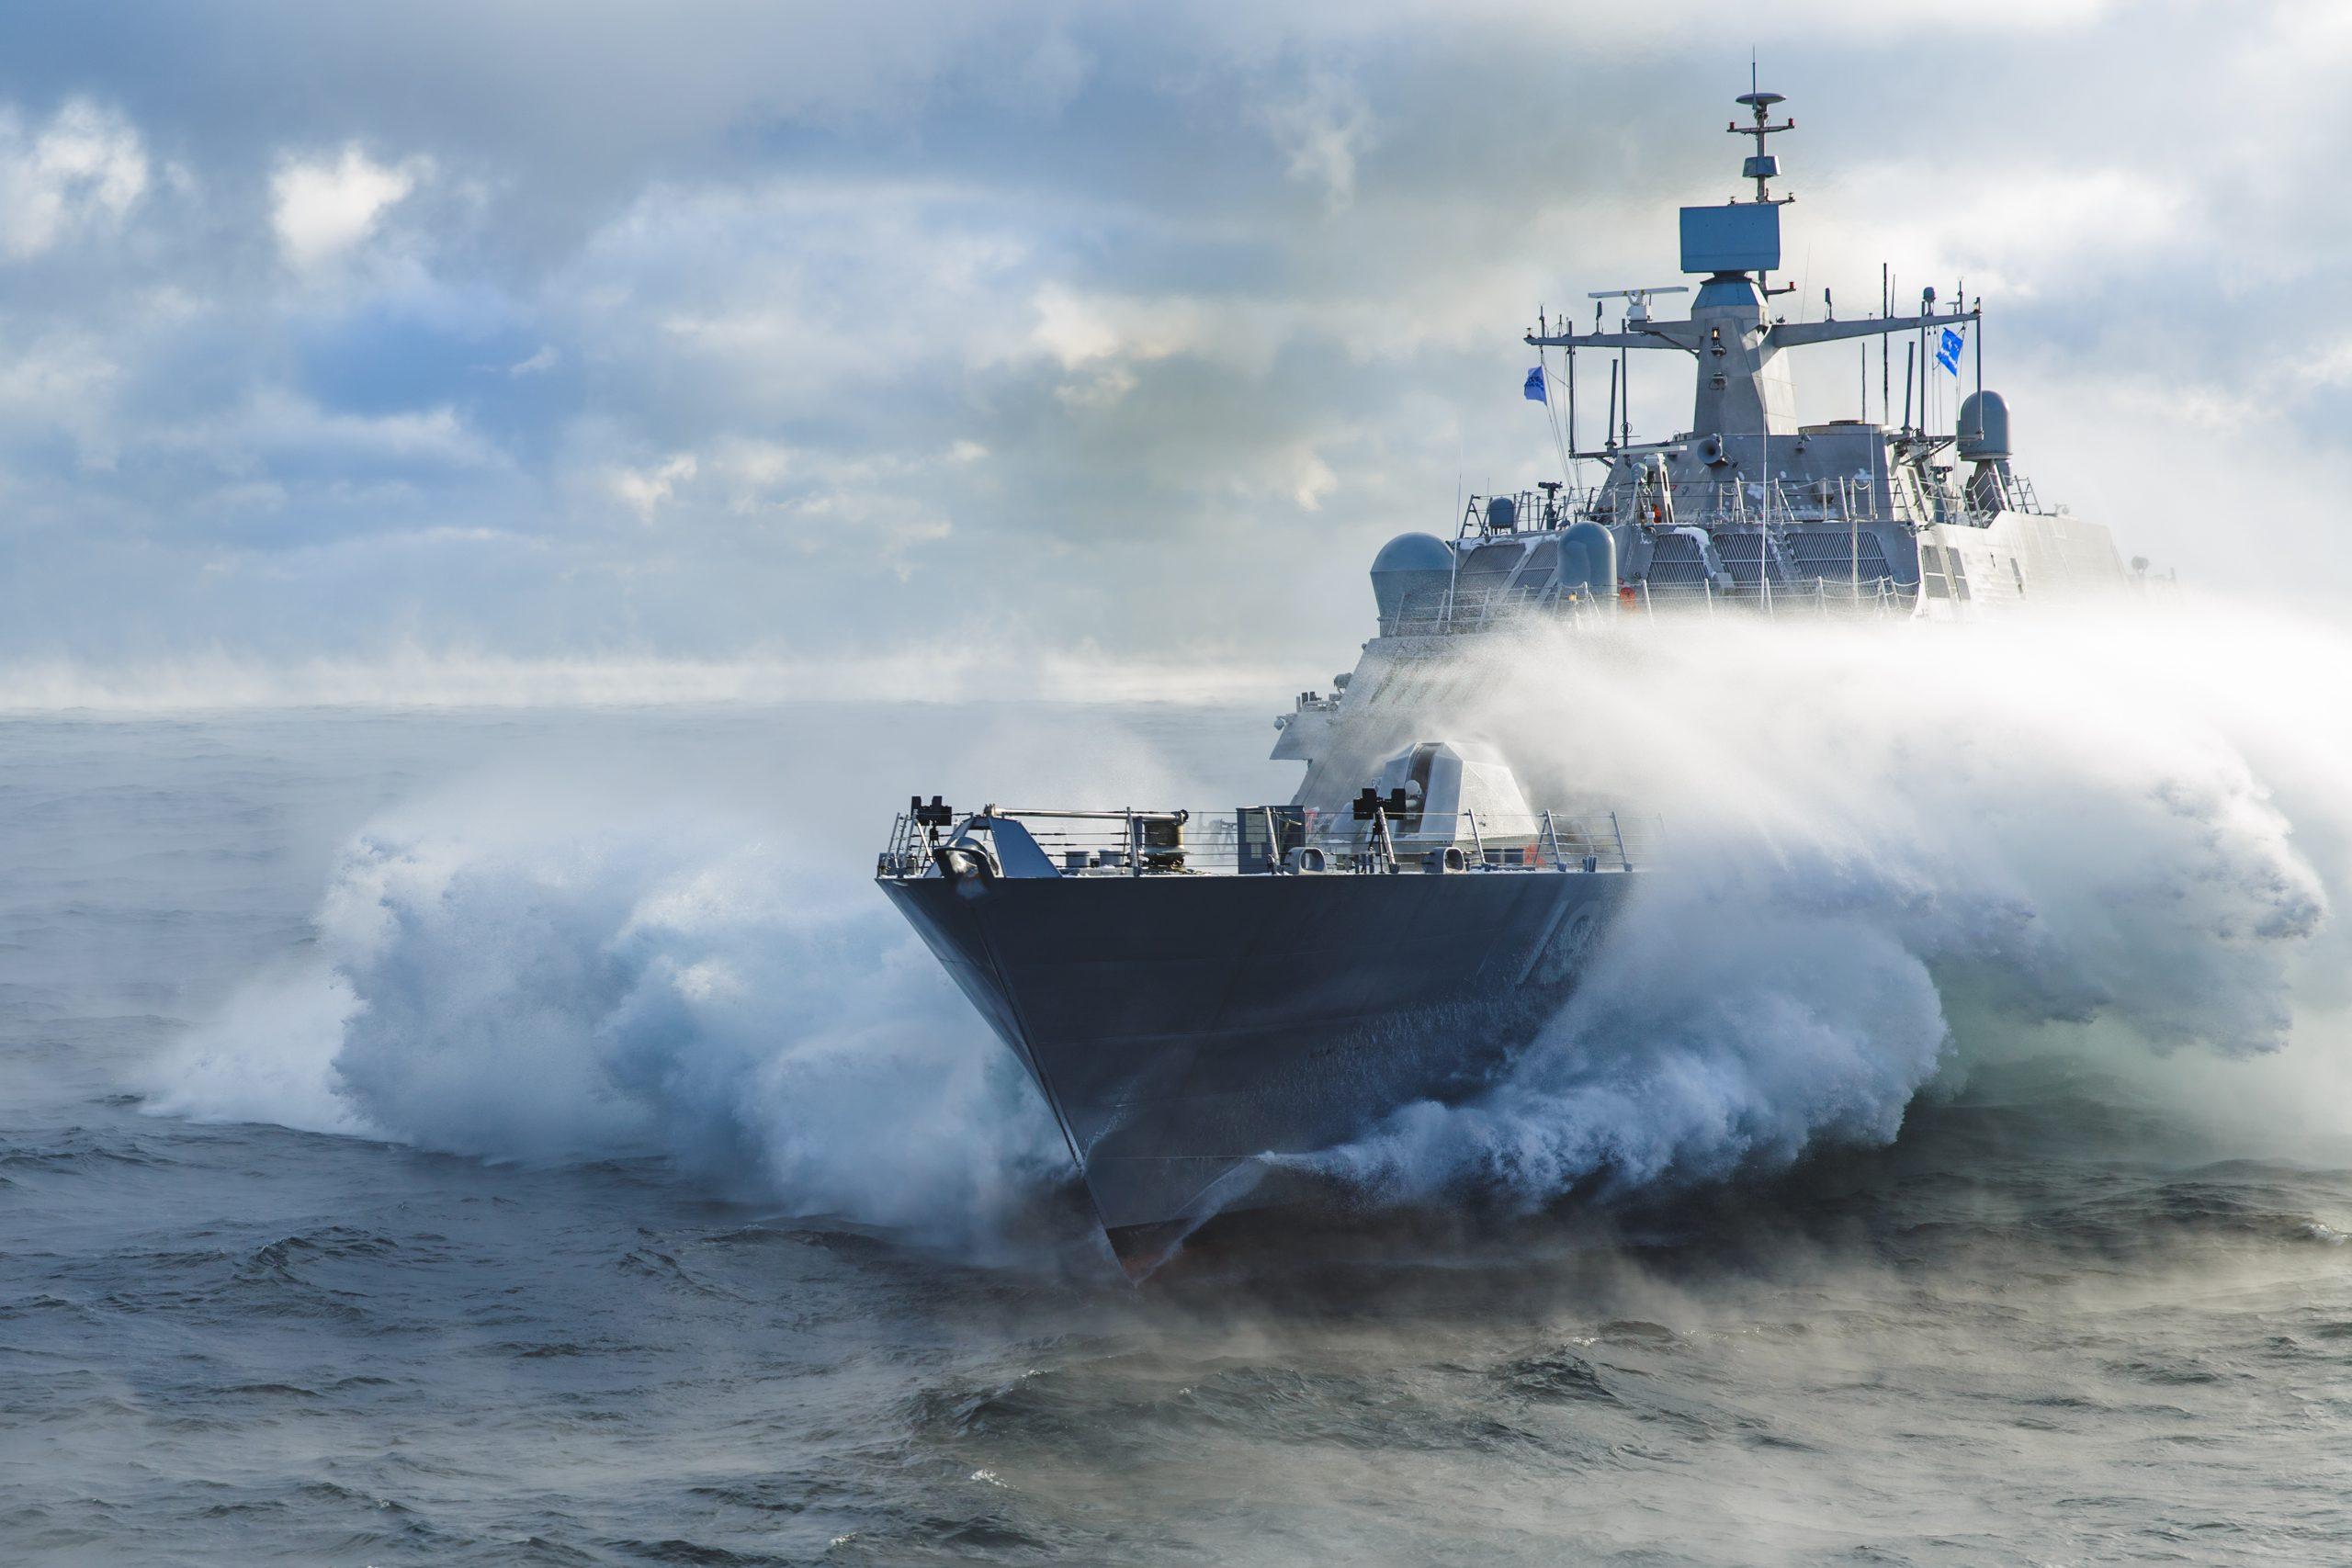 Lockheed Martin: Συμφωνία με ελληνικές εταιρείες για τις φρεγάτες ΜΕΚΟ-200